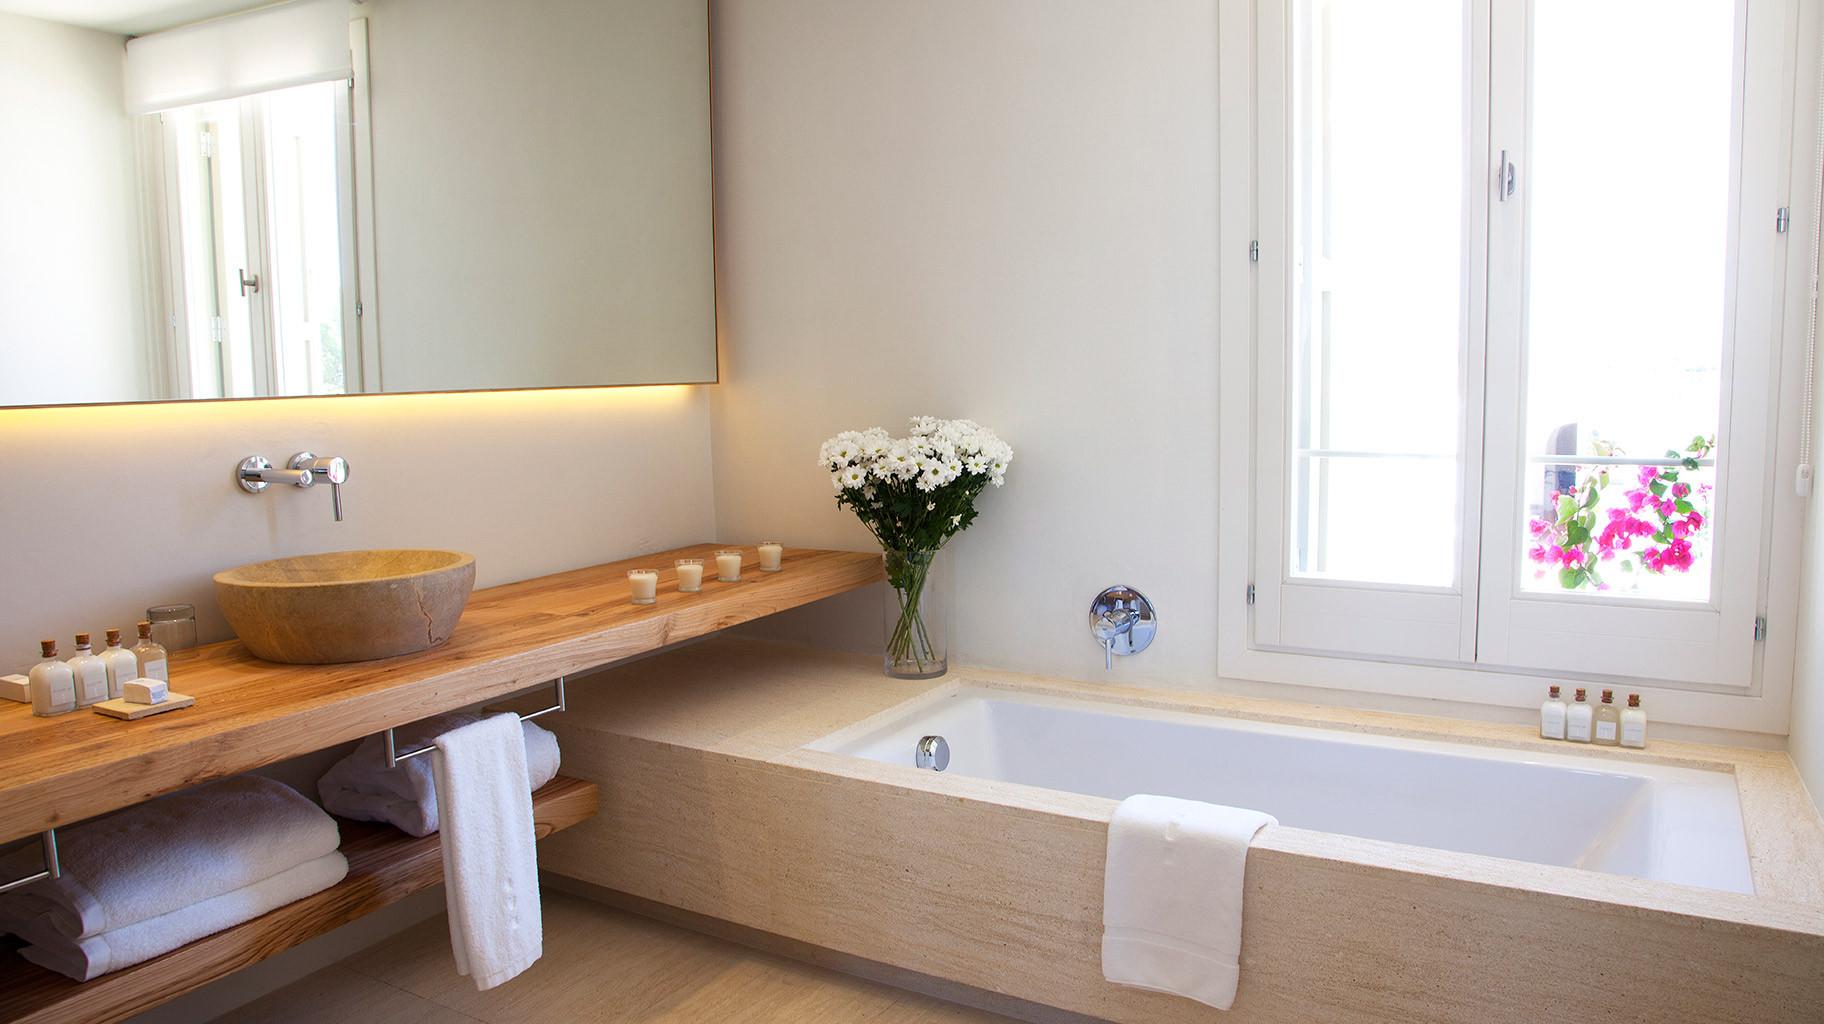 torralbenc-menorca-luxury-hotel-room-alb